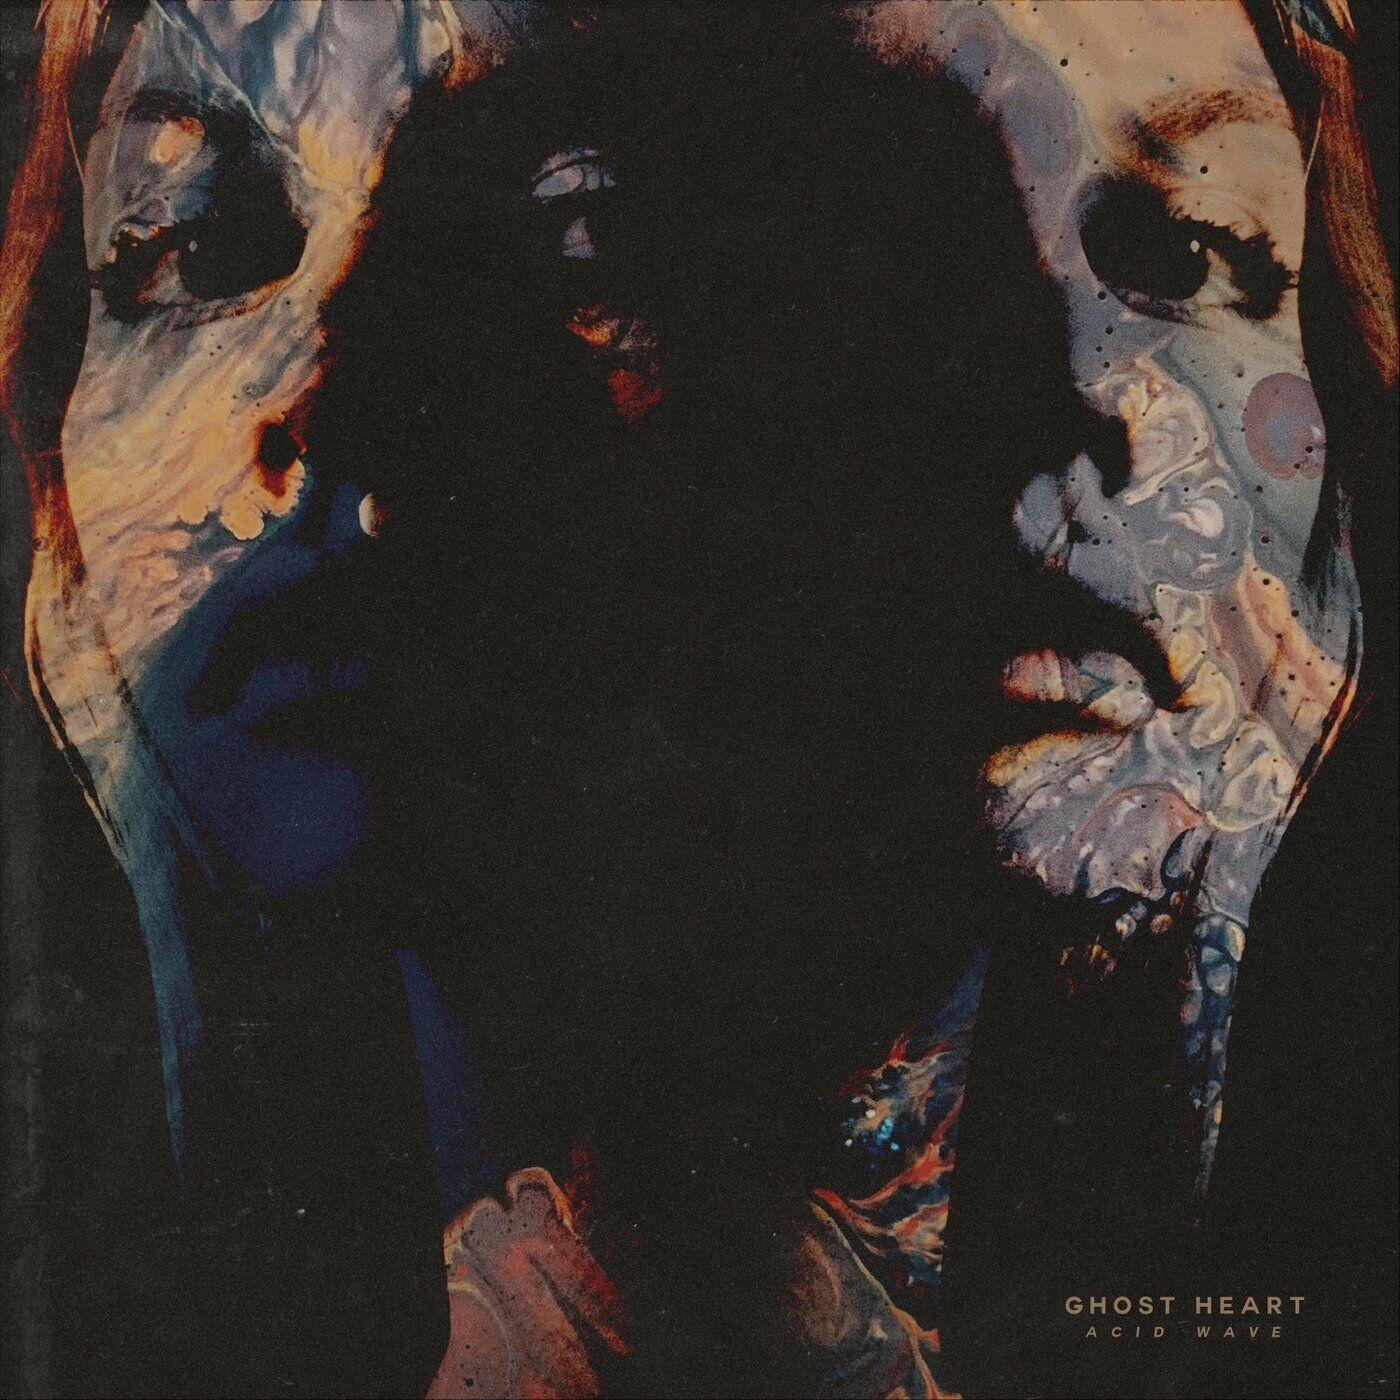 Ghost Heart - Acid Wave [single] (2020)